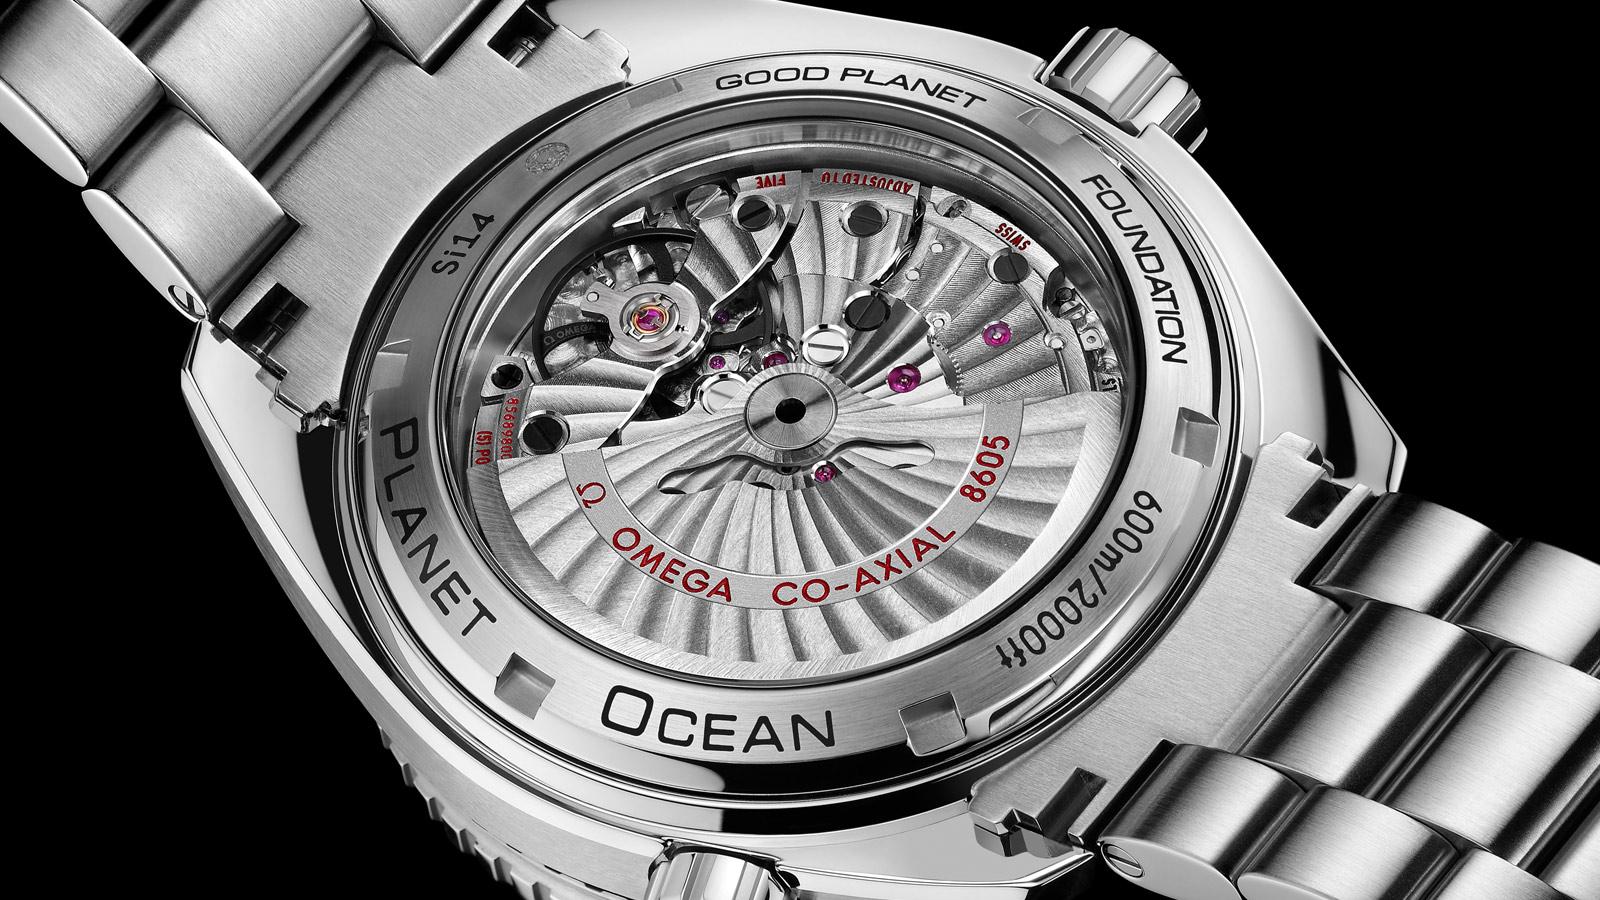 Seamaster 海洋宇宙600米腕表 海洋宇宙600米 欧米茄43.5毫米同轴GMT腕表 - 232.30.44.22.03.001 - 查看 2